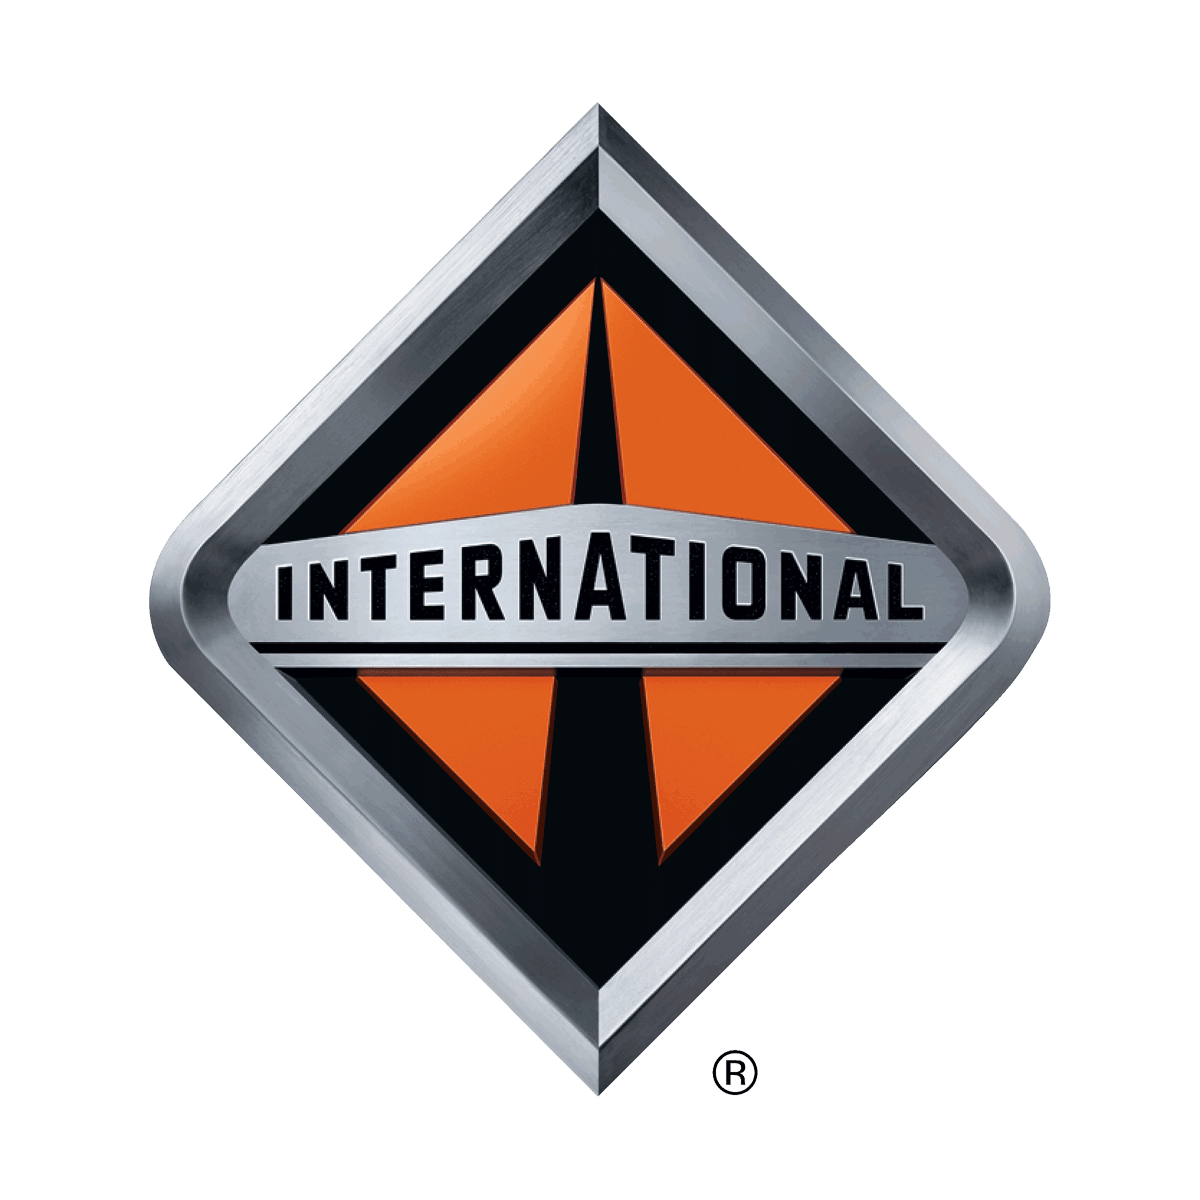 Buy International Trucks at JY Enterprises Inc